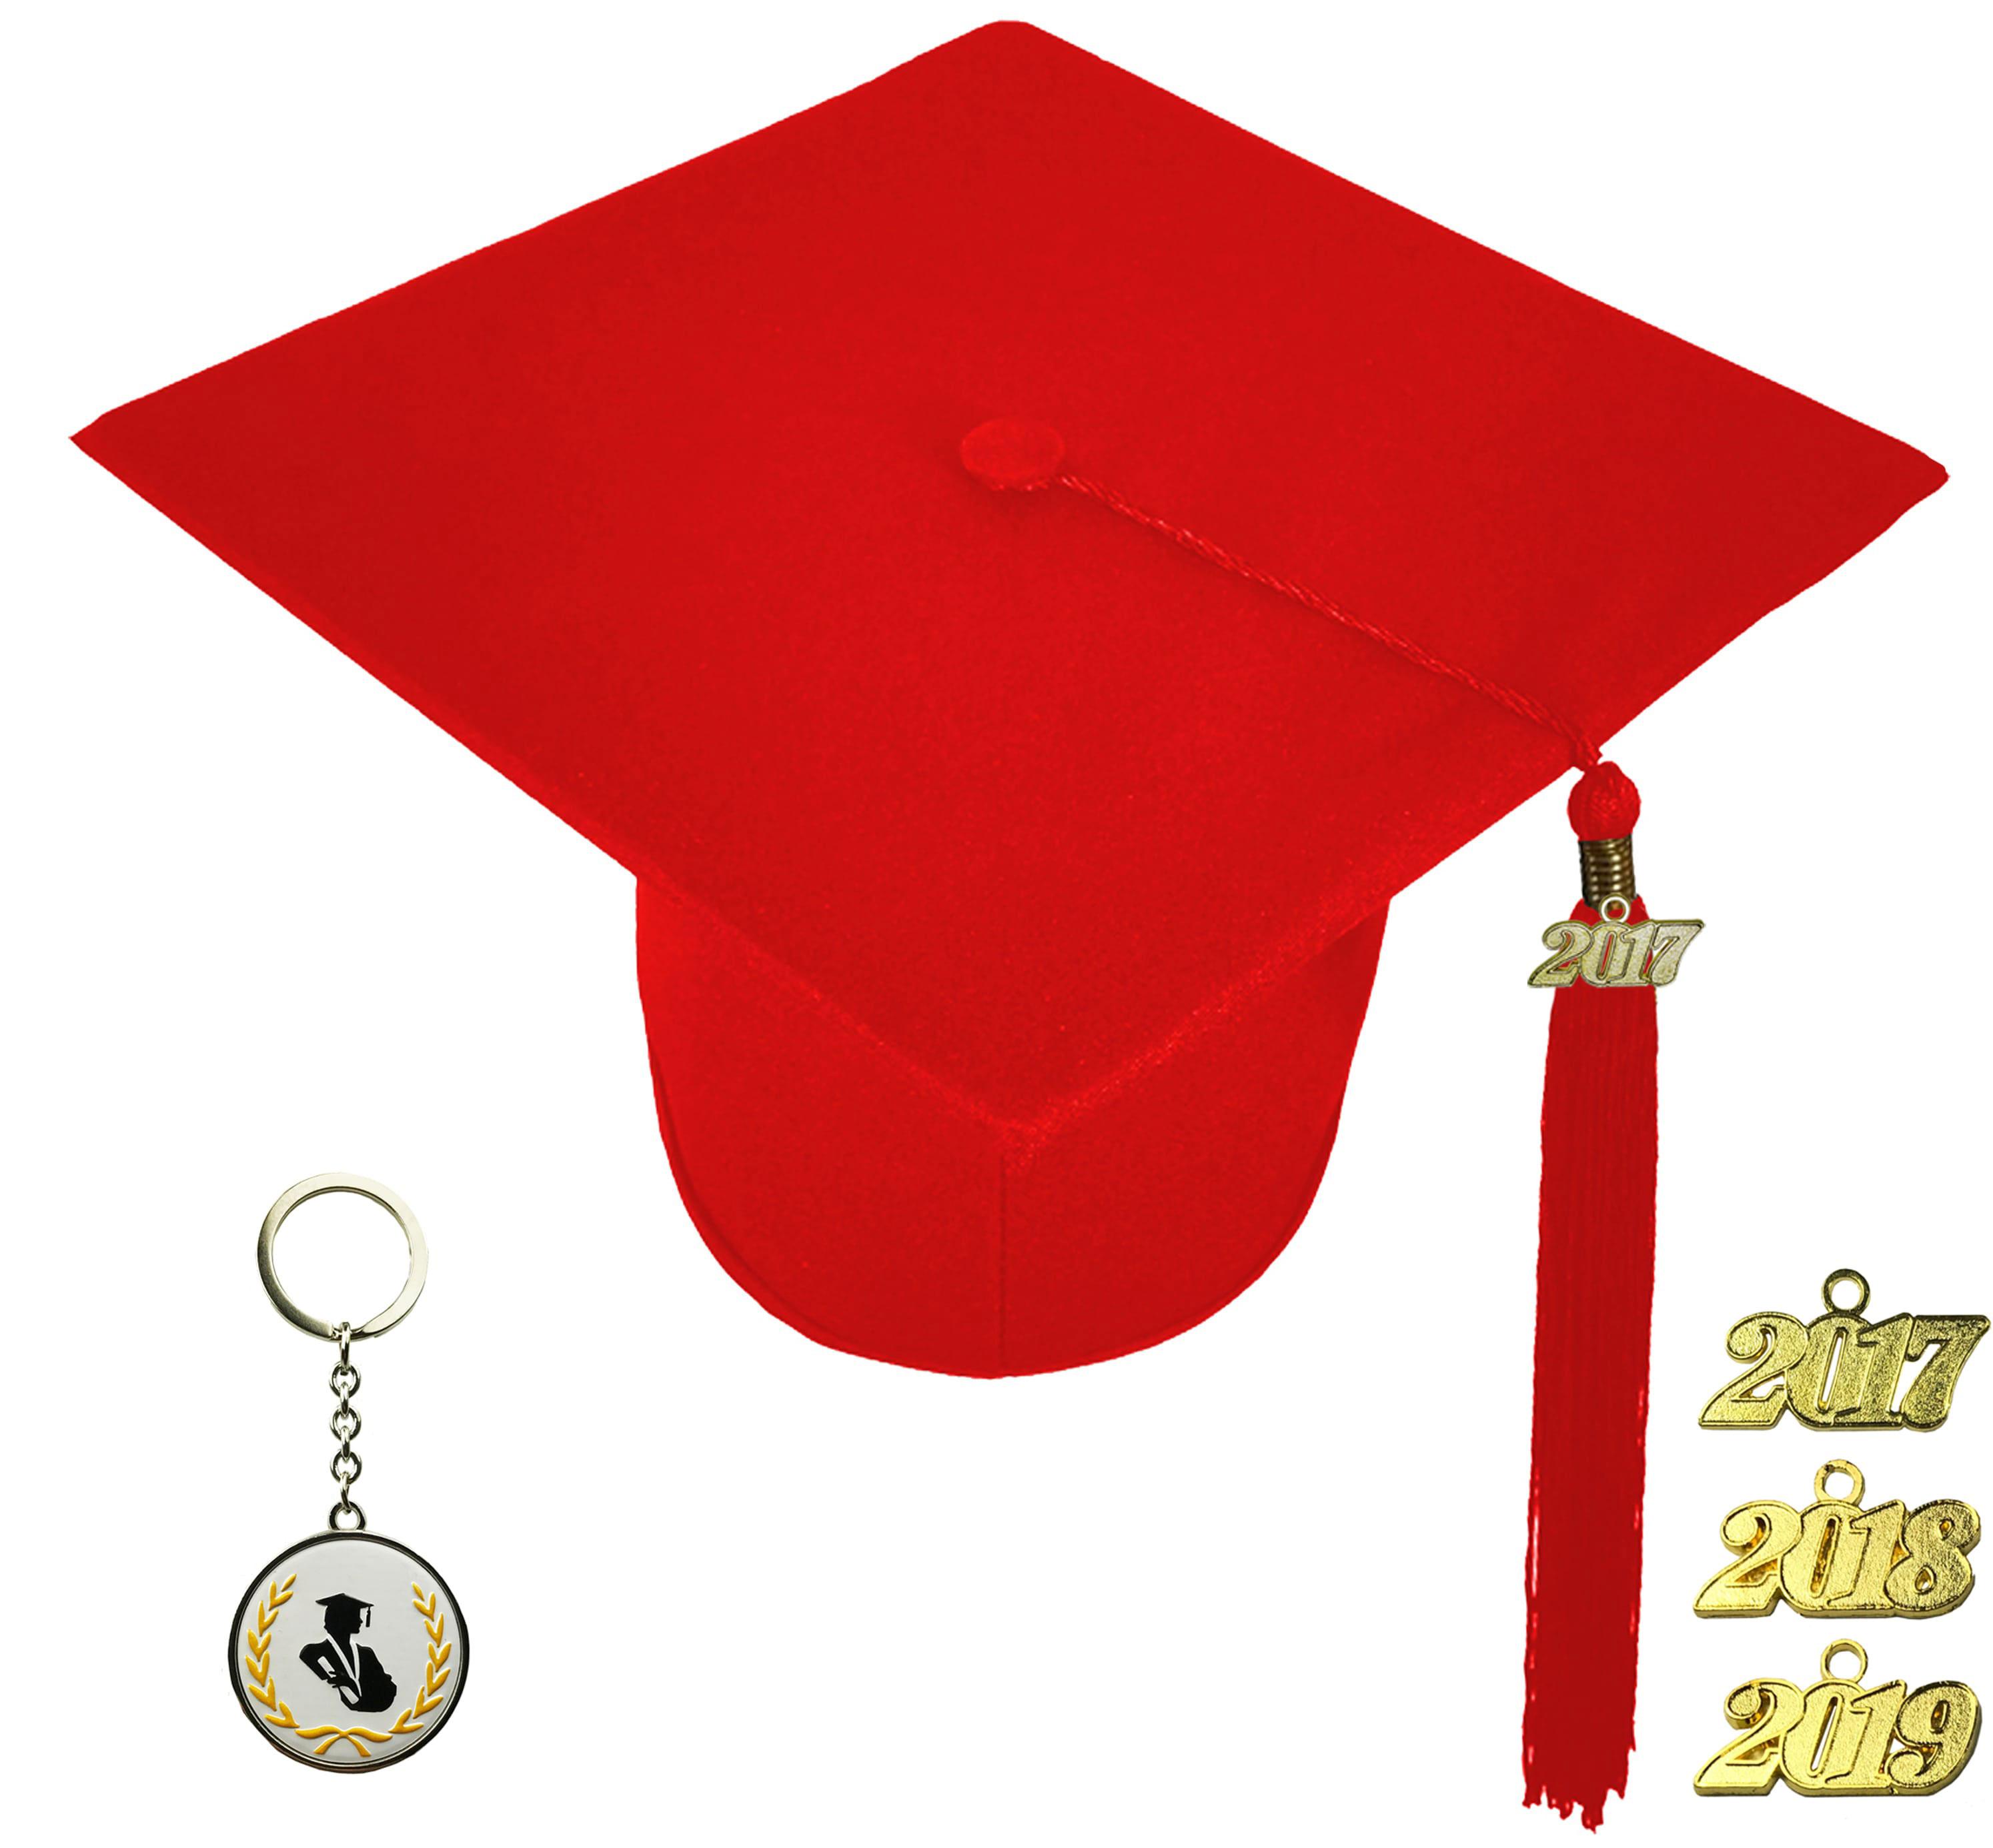 MATTE RED GRADUATION CAP ELEMENTARY SCHOOL-rs4251465608690